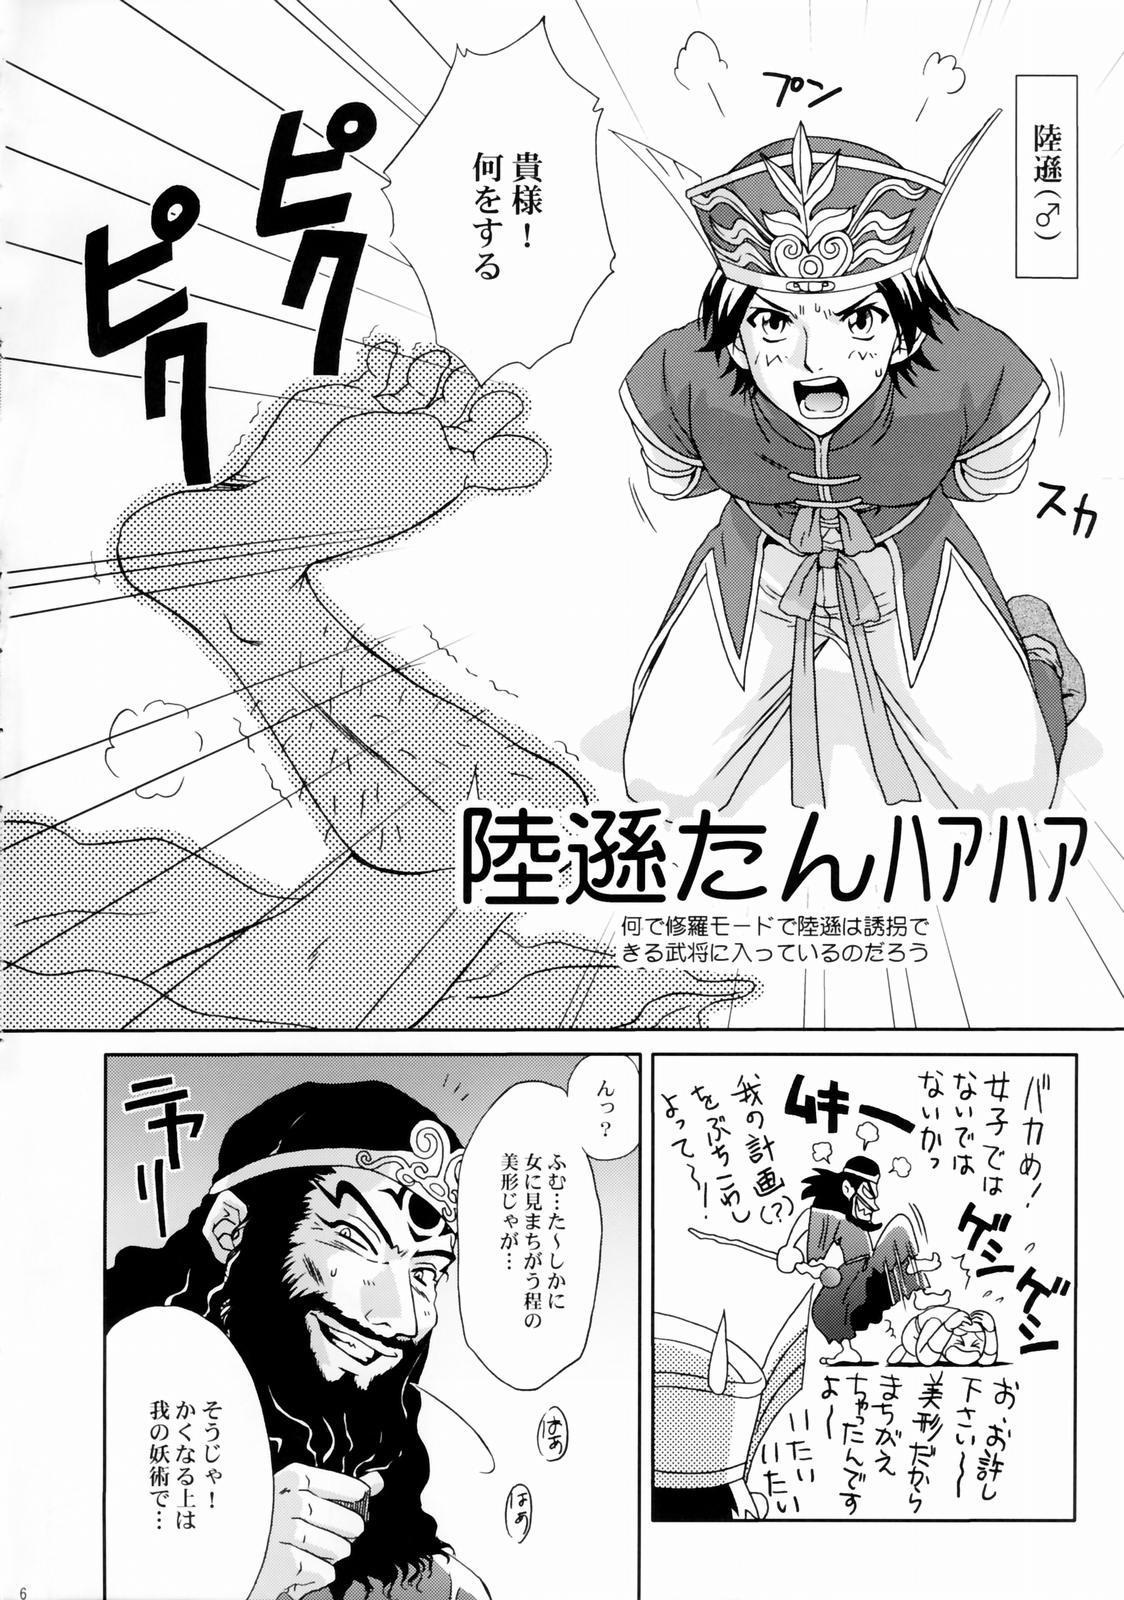 In Sangoku Musou Rikuson Gaiden 4